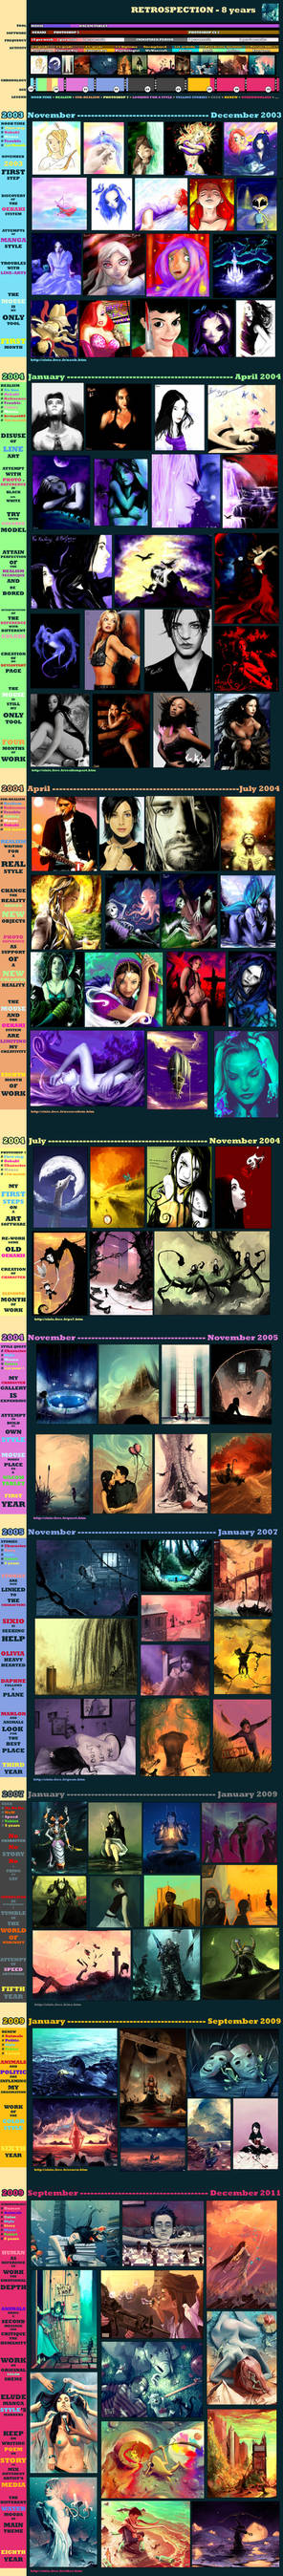 Retrospection 8 years